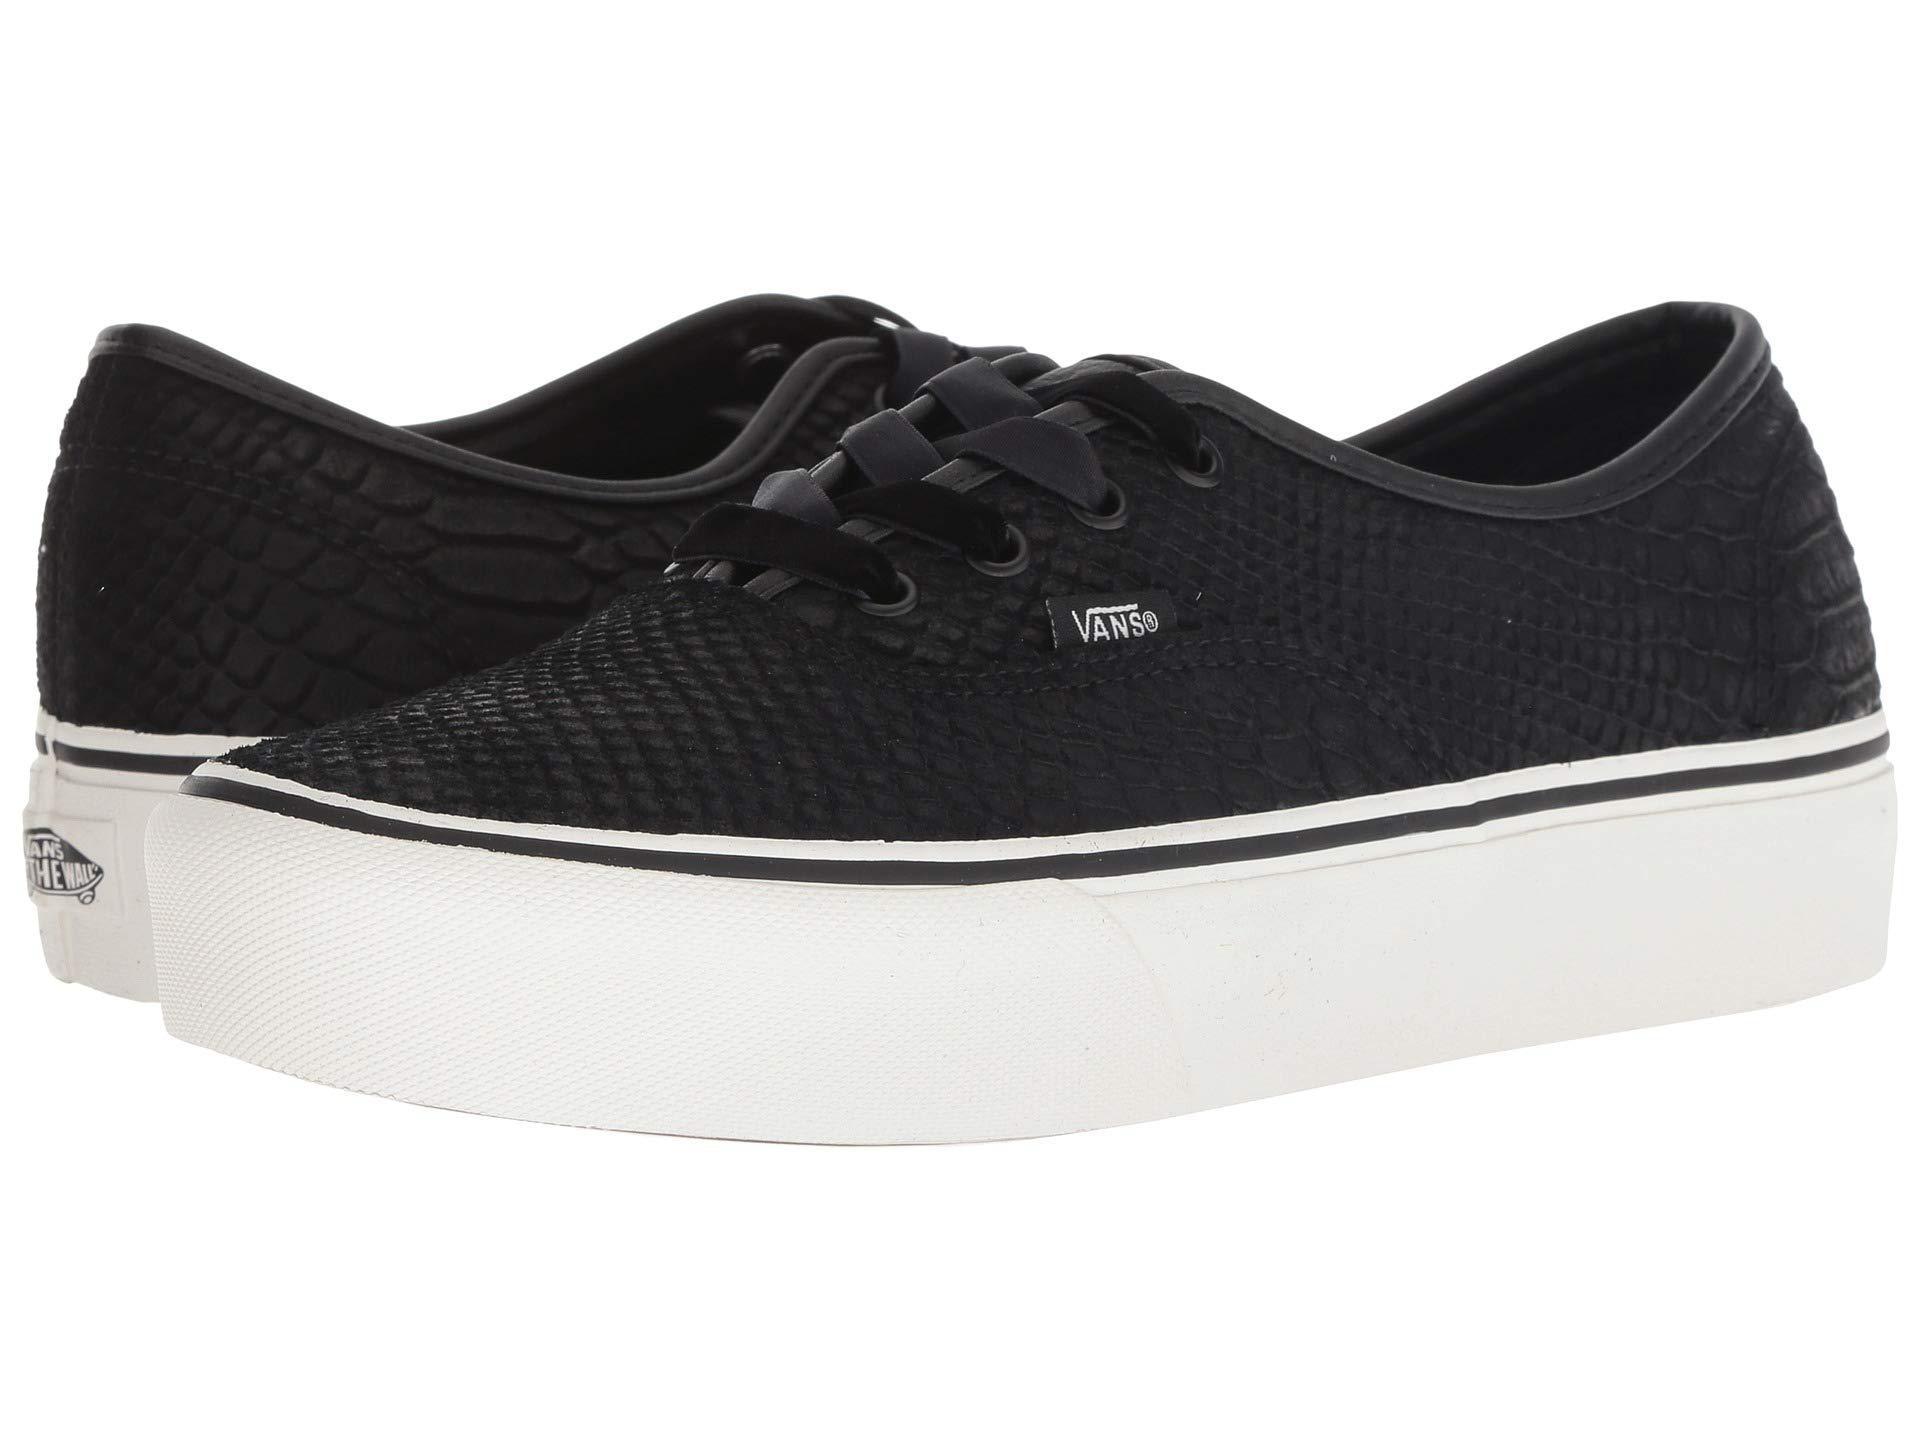 Vans - Authentic Platform 2.0 ((leather) Snake black) Skate Shoes for. View  fullscreen 55246f034